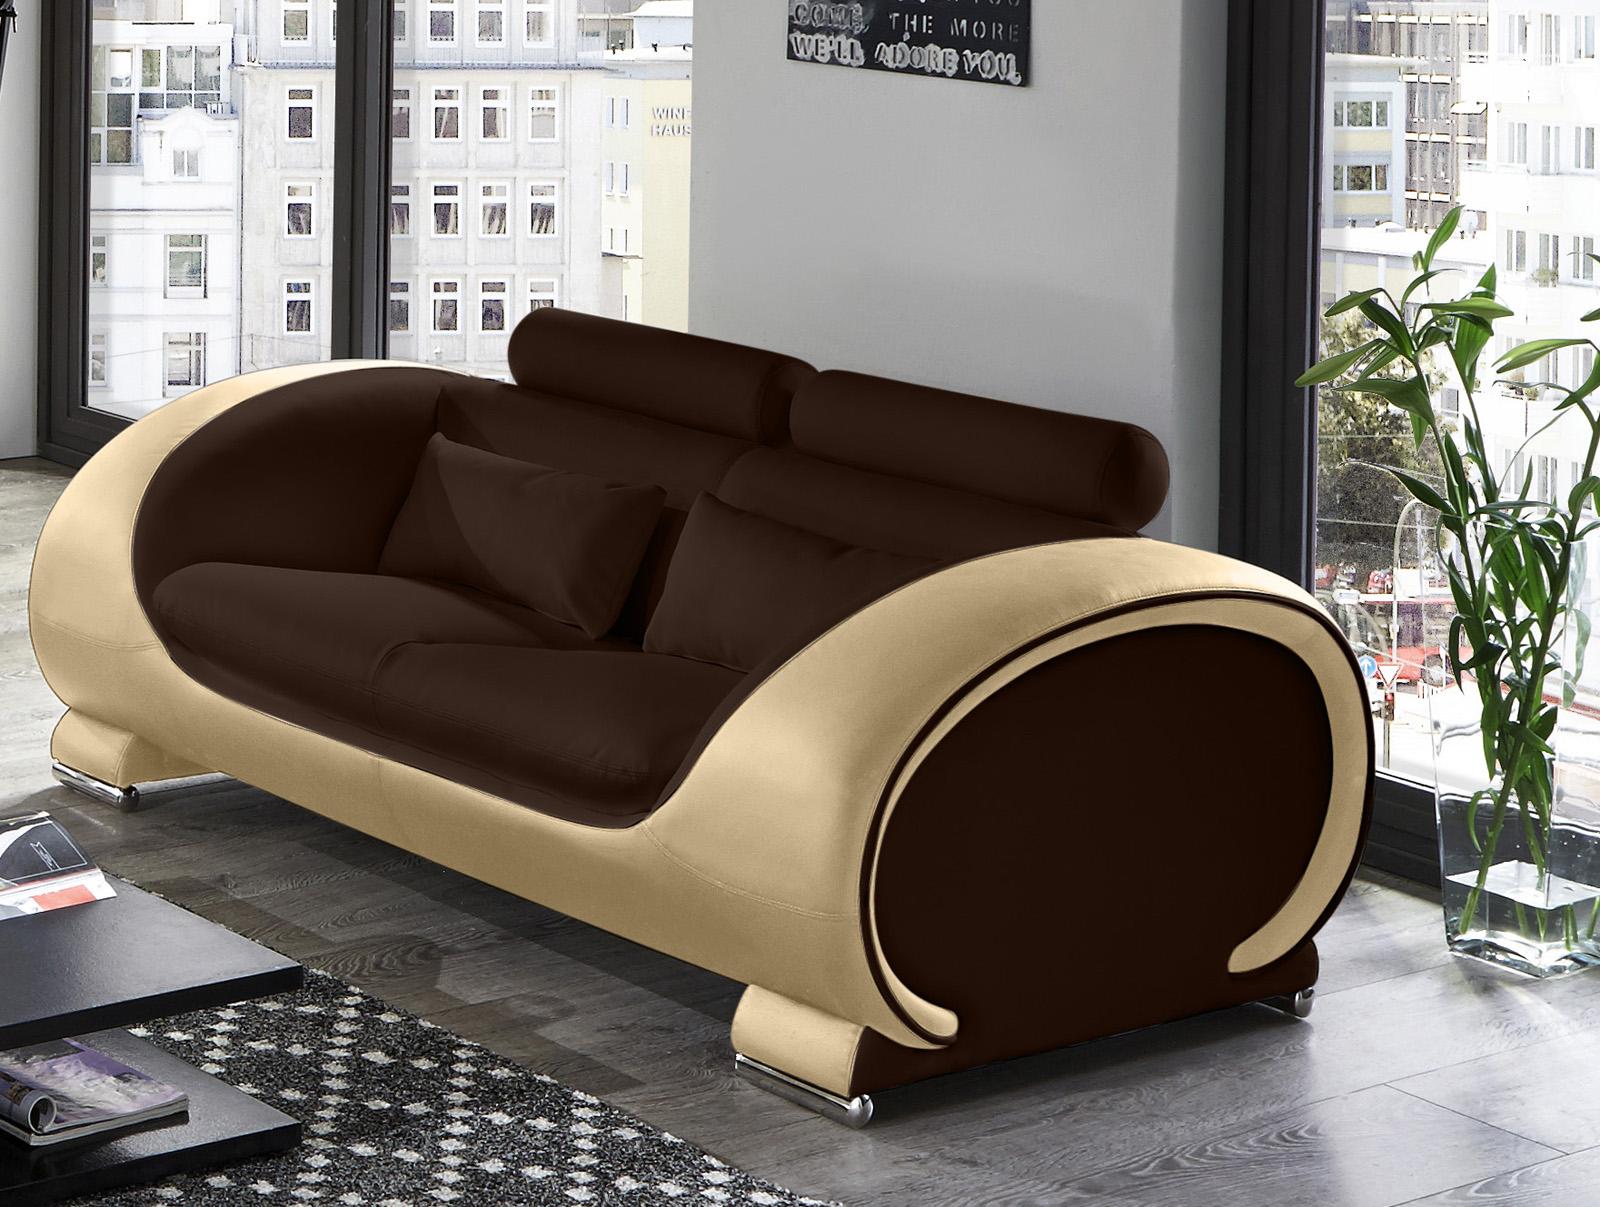 sam 2 3 sitzer sofa garnitur 2tlg in braun creme vigo auf lager. Black Bedroom Furniture Sets. Home Design Ideas